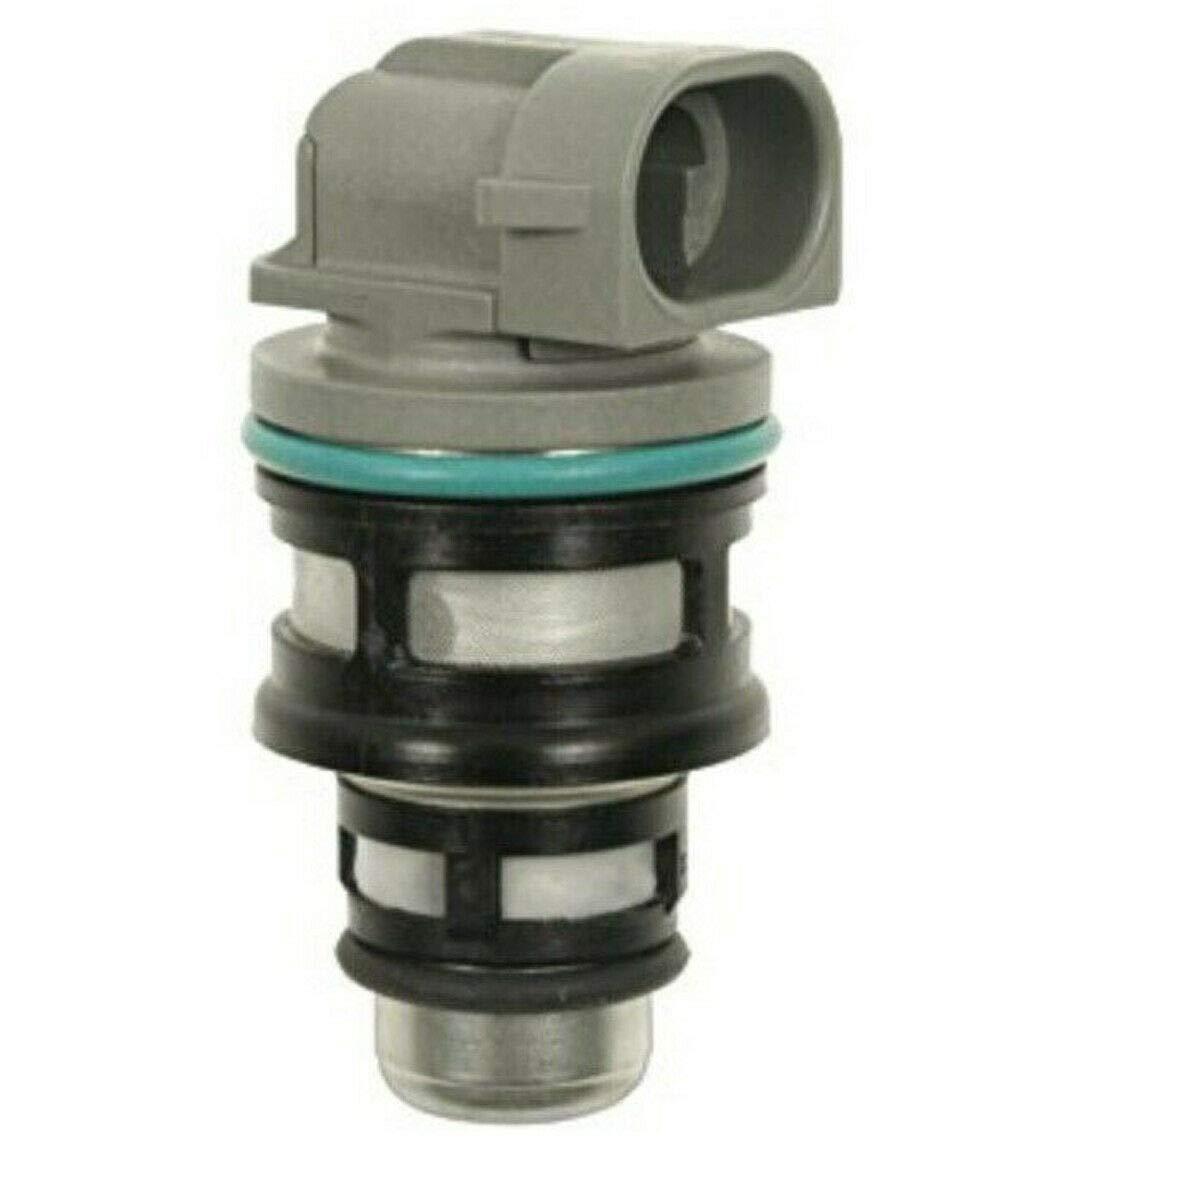 New Fuel Injector Fit Chevrolet Cavalier S-10 2.2L 95-97 FJ-100 1711319